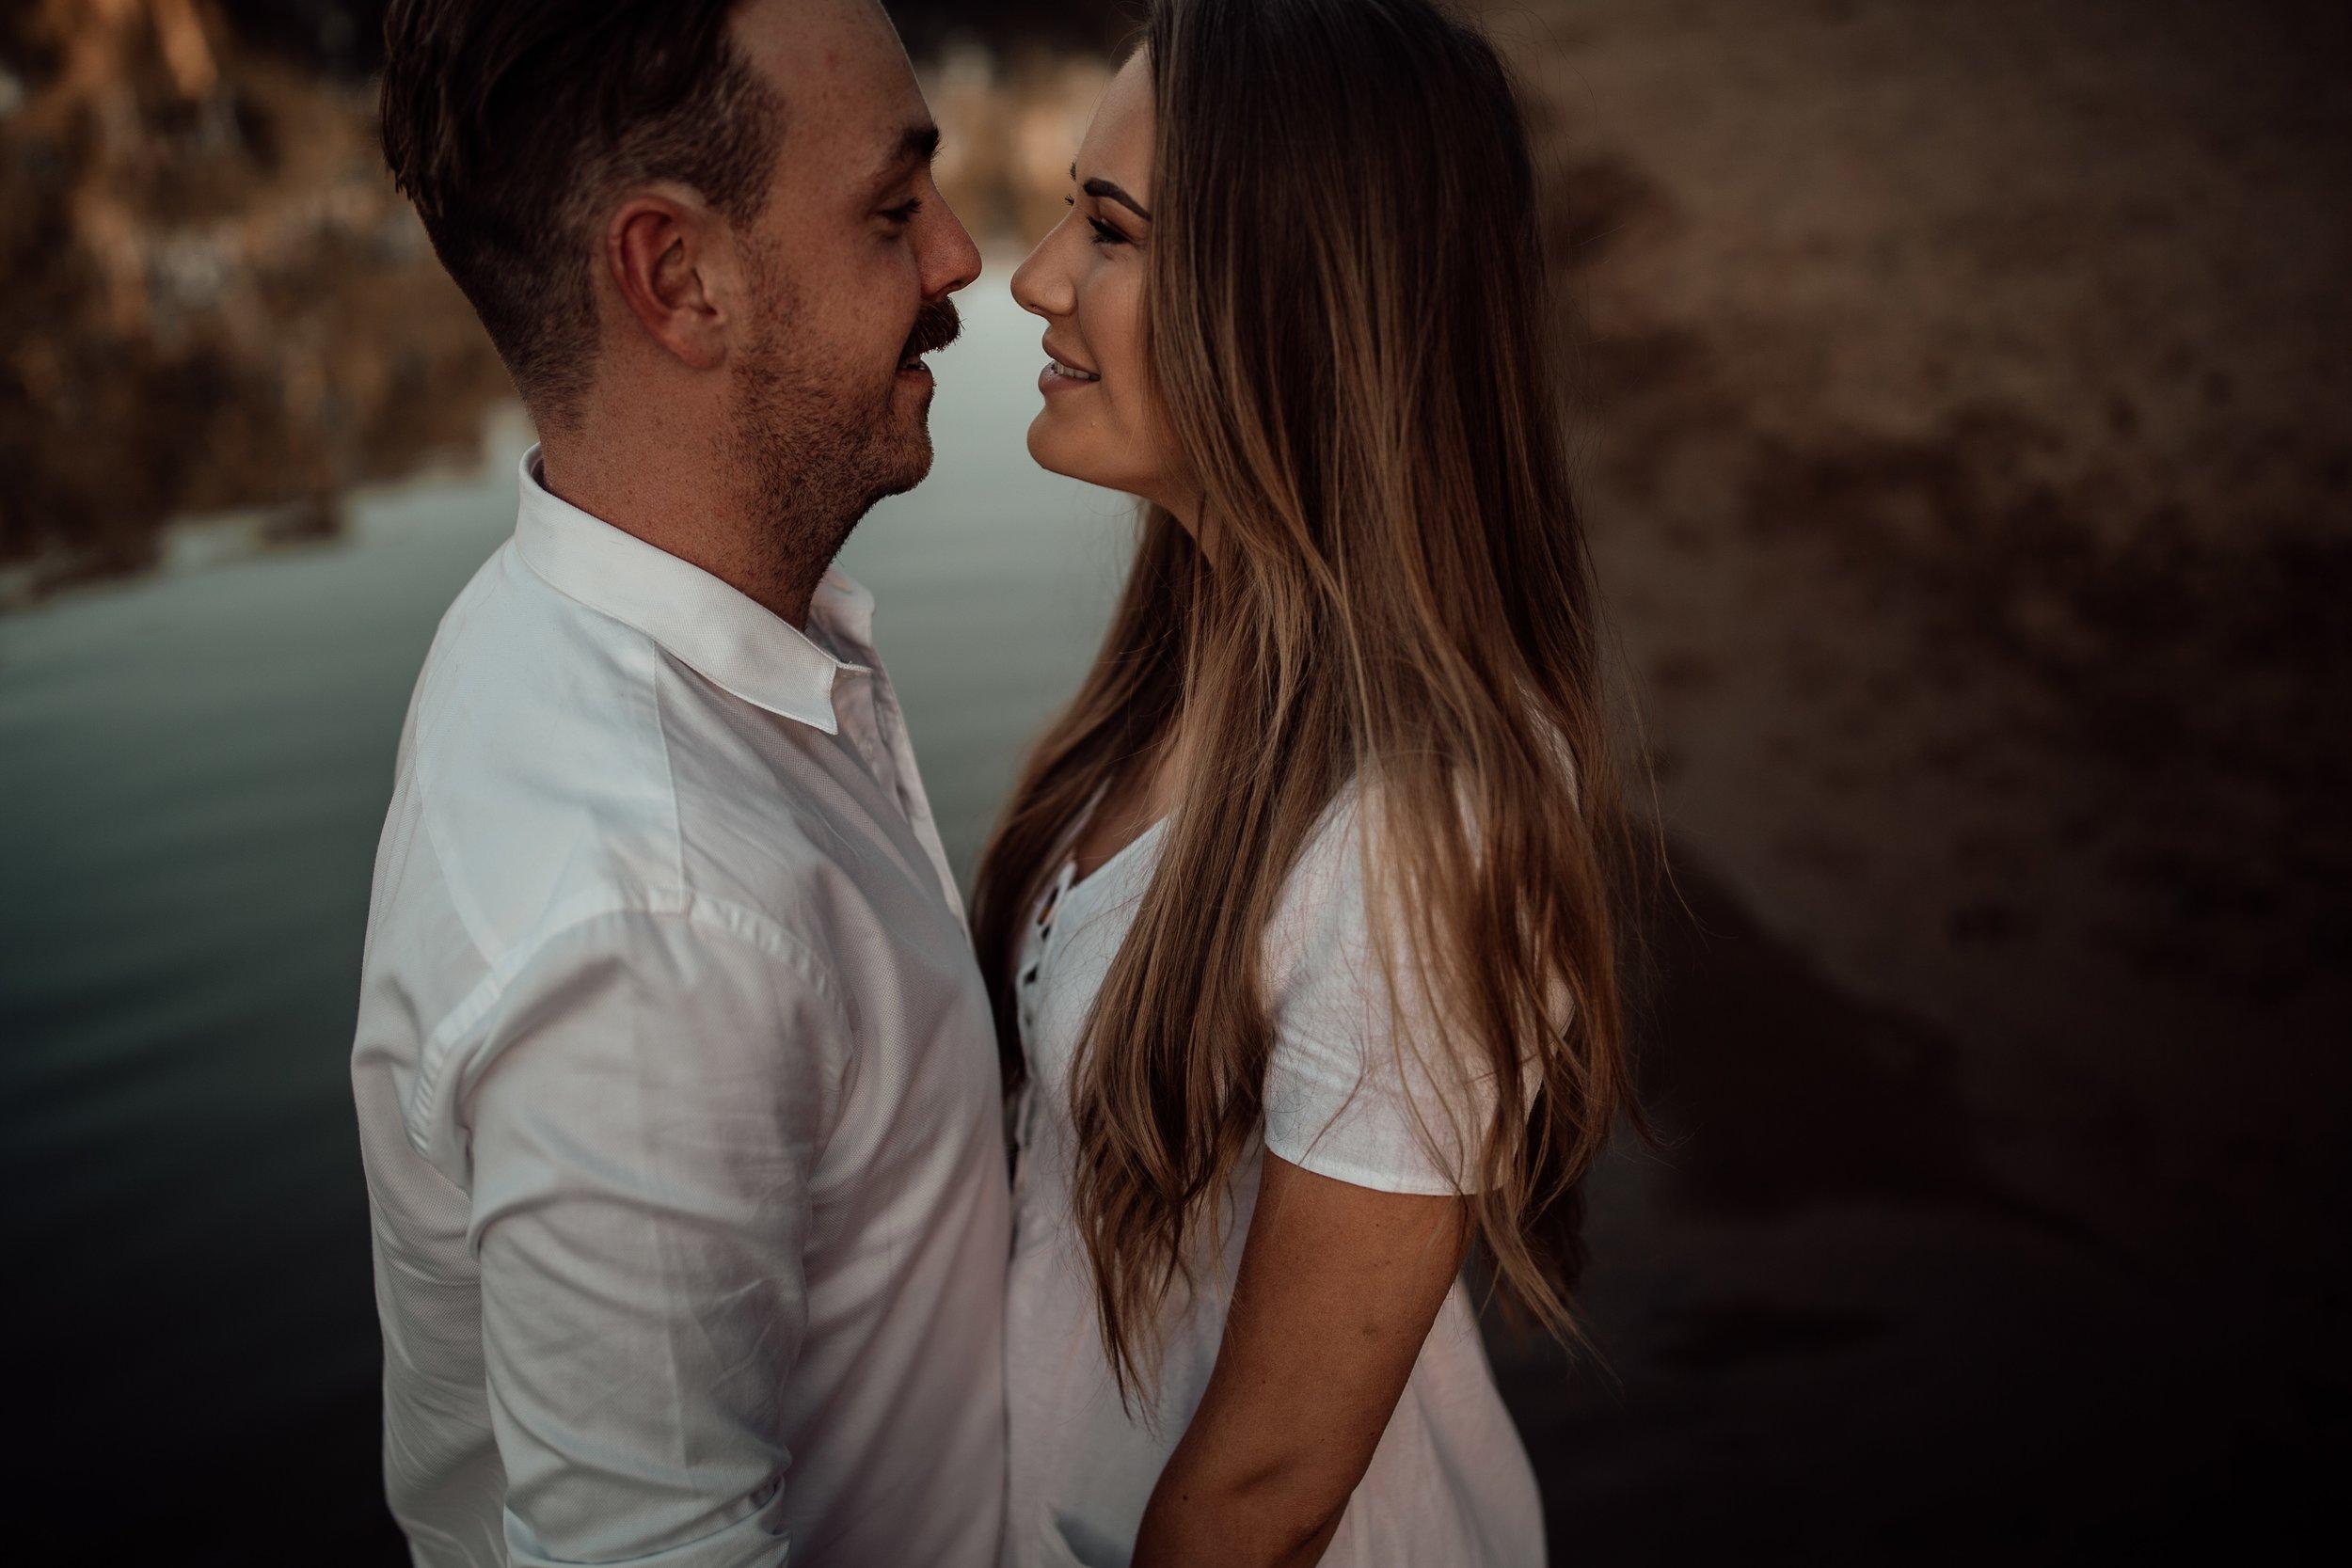 mickalathomas_puremacphotography_weddingphotographer_couplephotographer_Sheppartonphotographer_2830.jpg